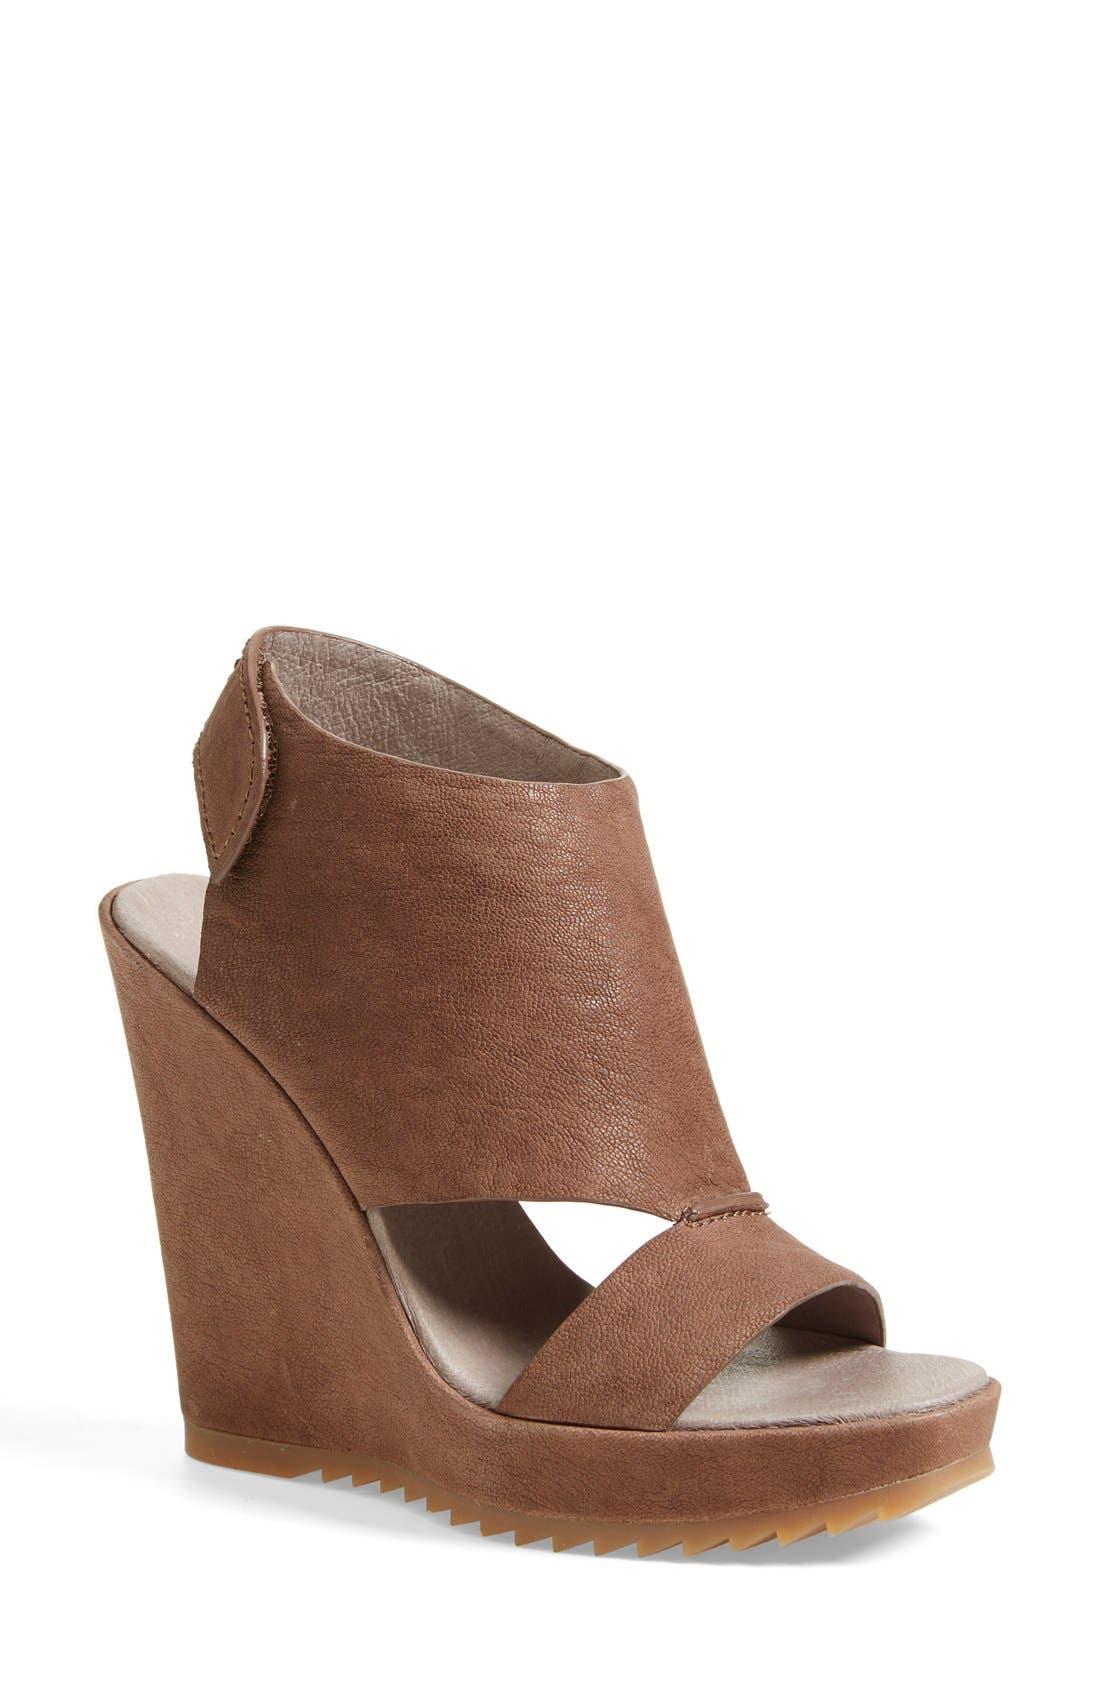 Main Image - Vince Camuto 'Gevara' Leather Platform Wedge (Women)